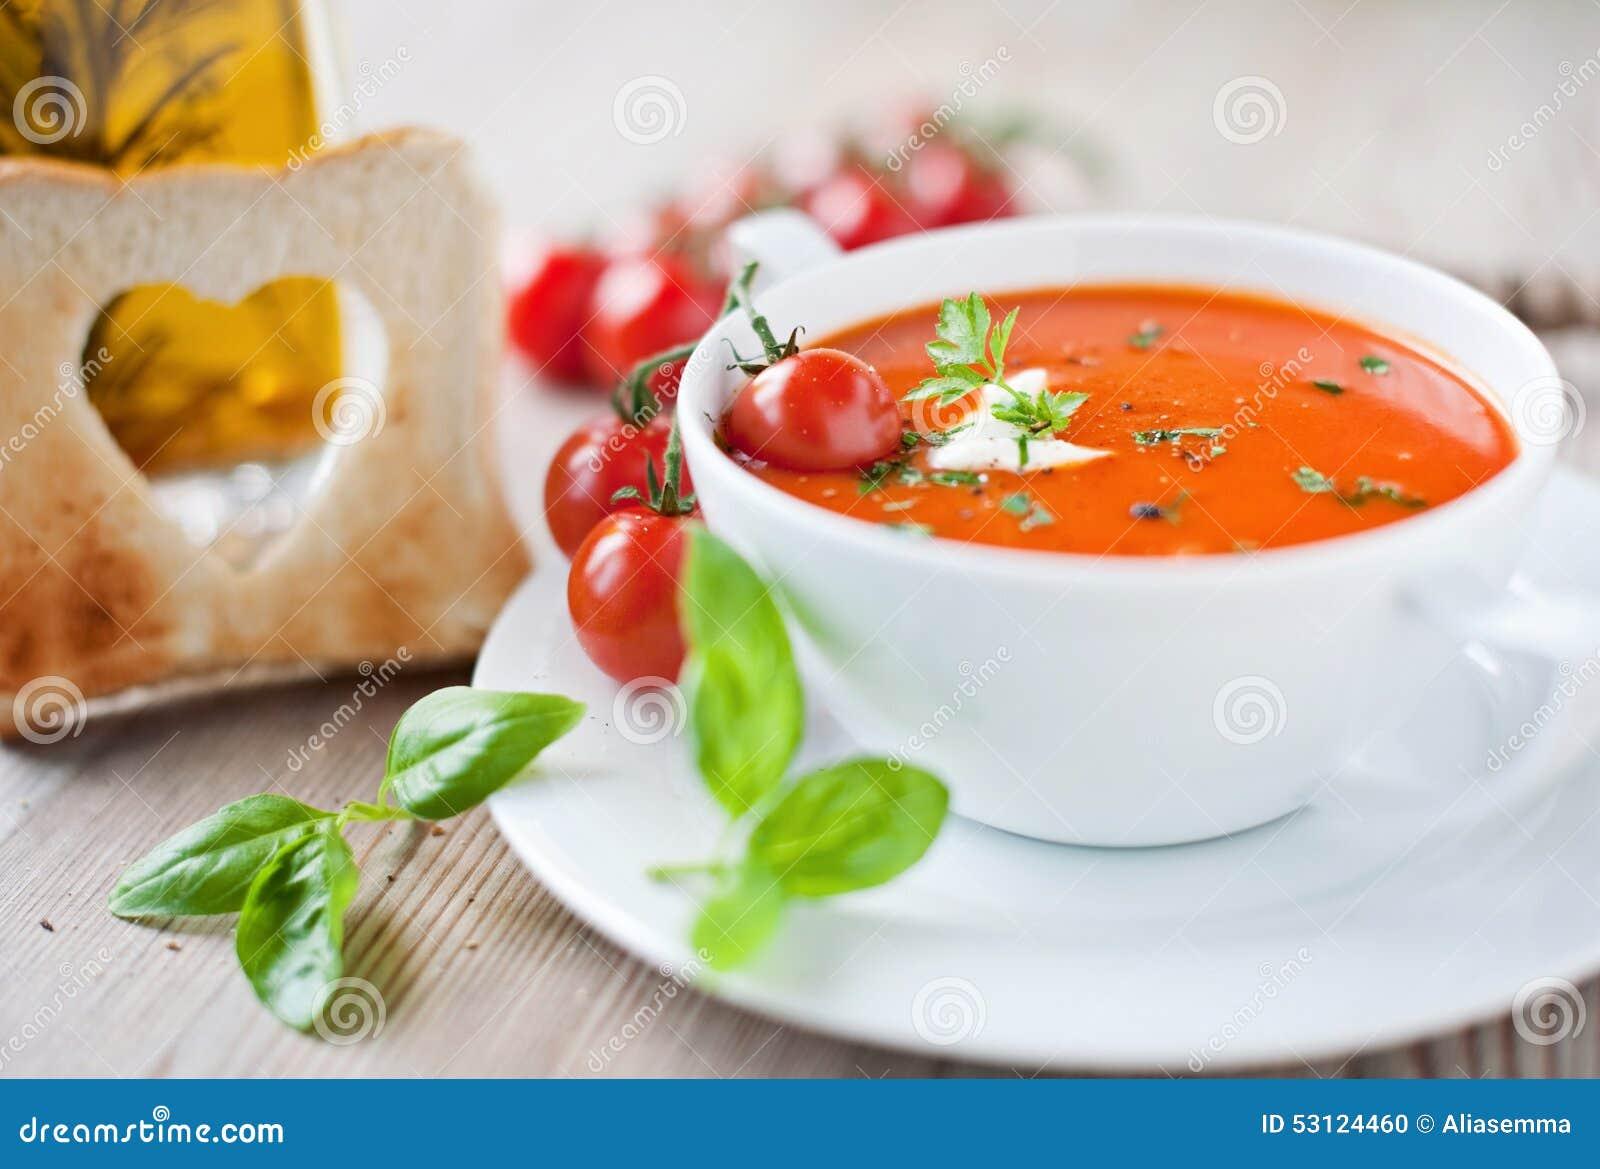 potage de tomate photo stock image 53124460. Black Bedroom Furniture Sets. Home Design Ideas